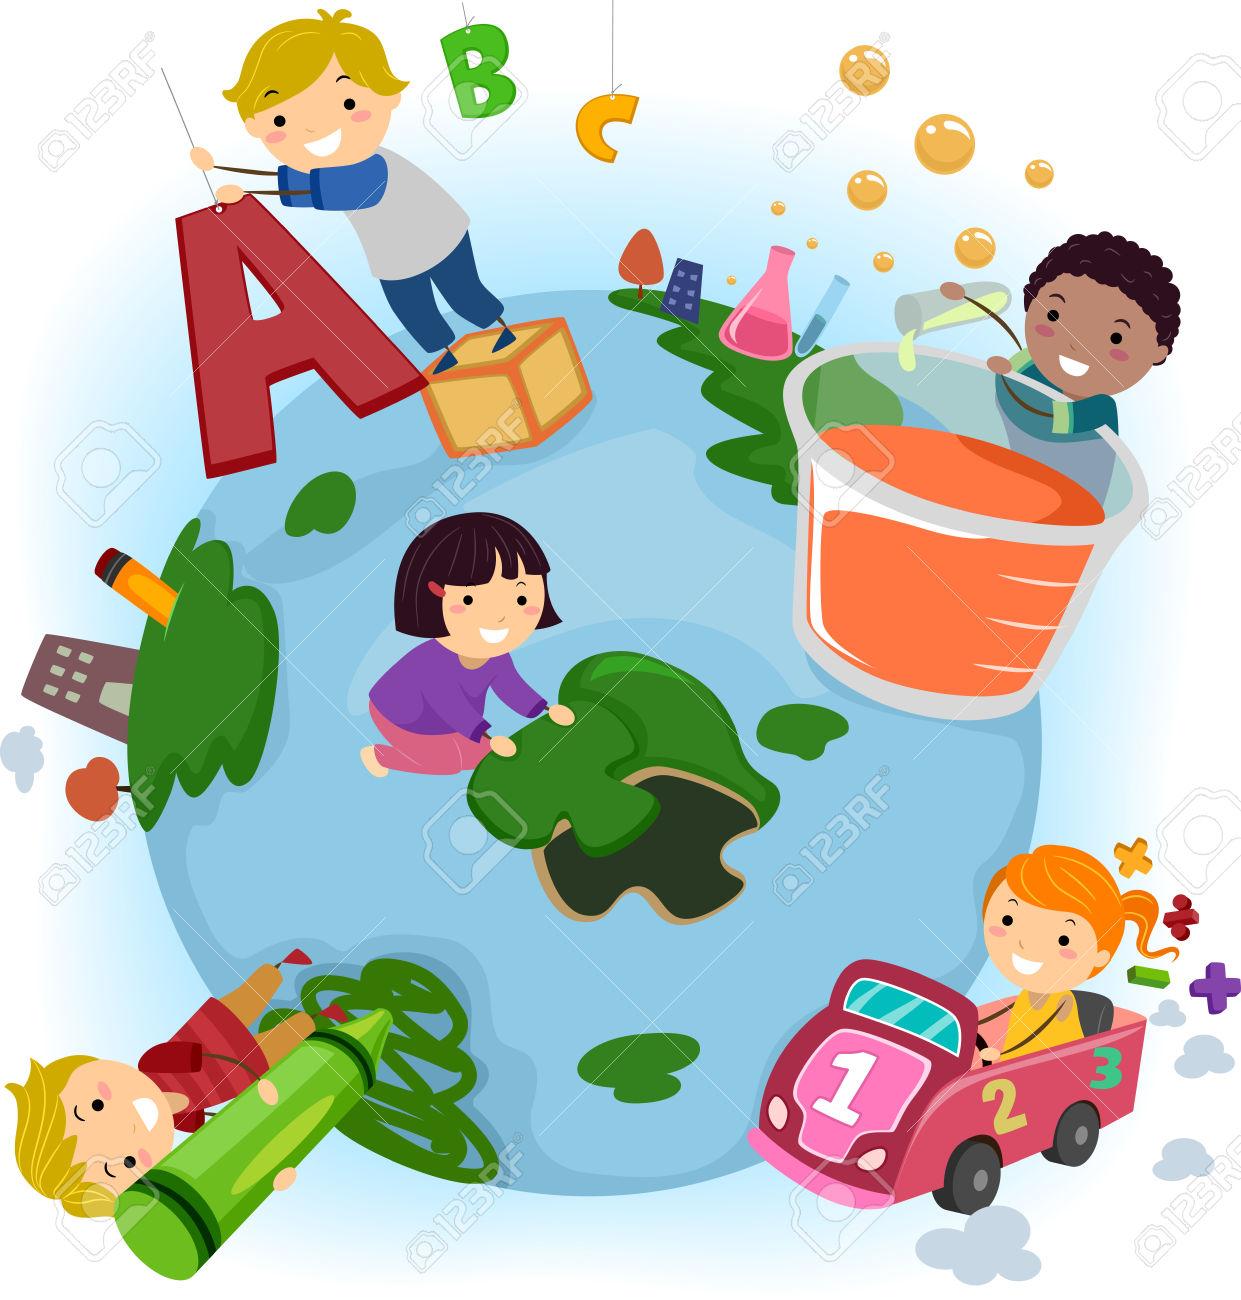 Free School Activities Cliparts, Download Free Clip Art.